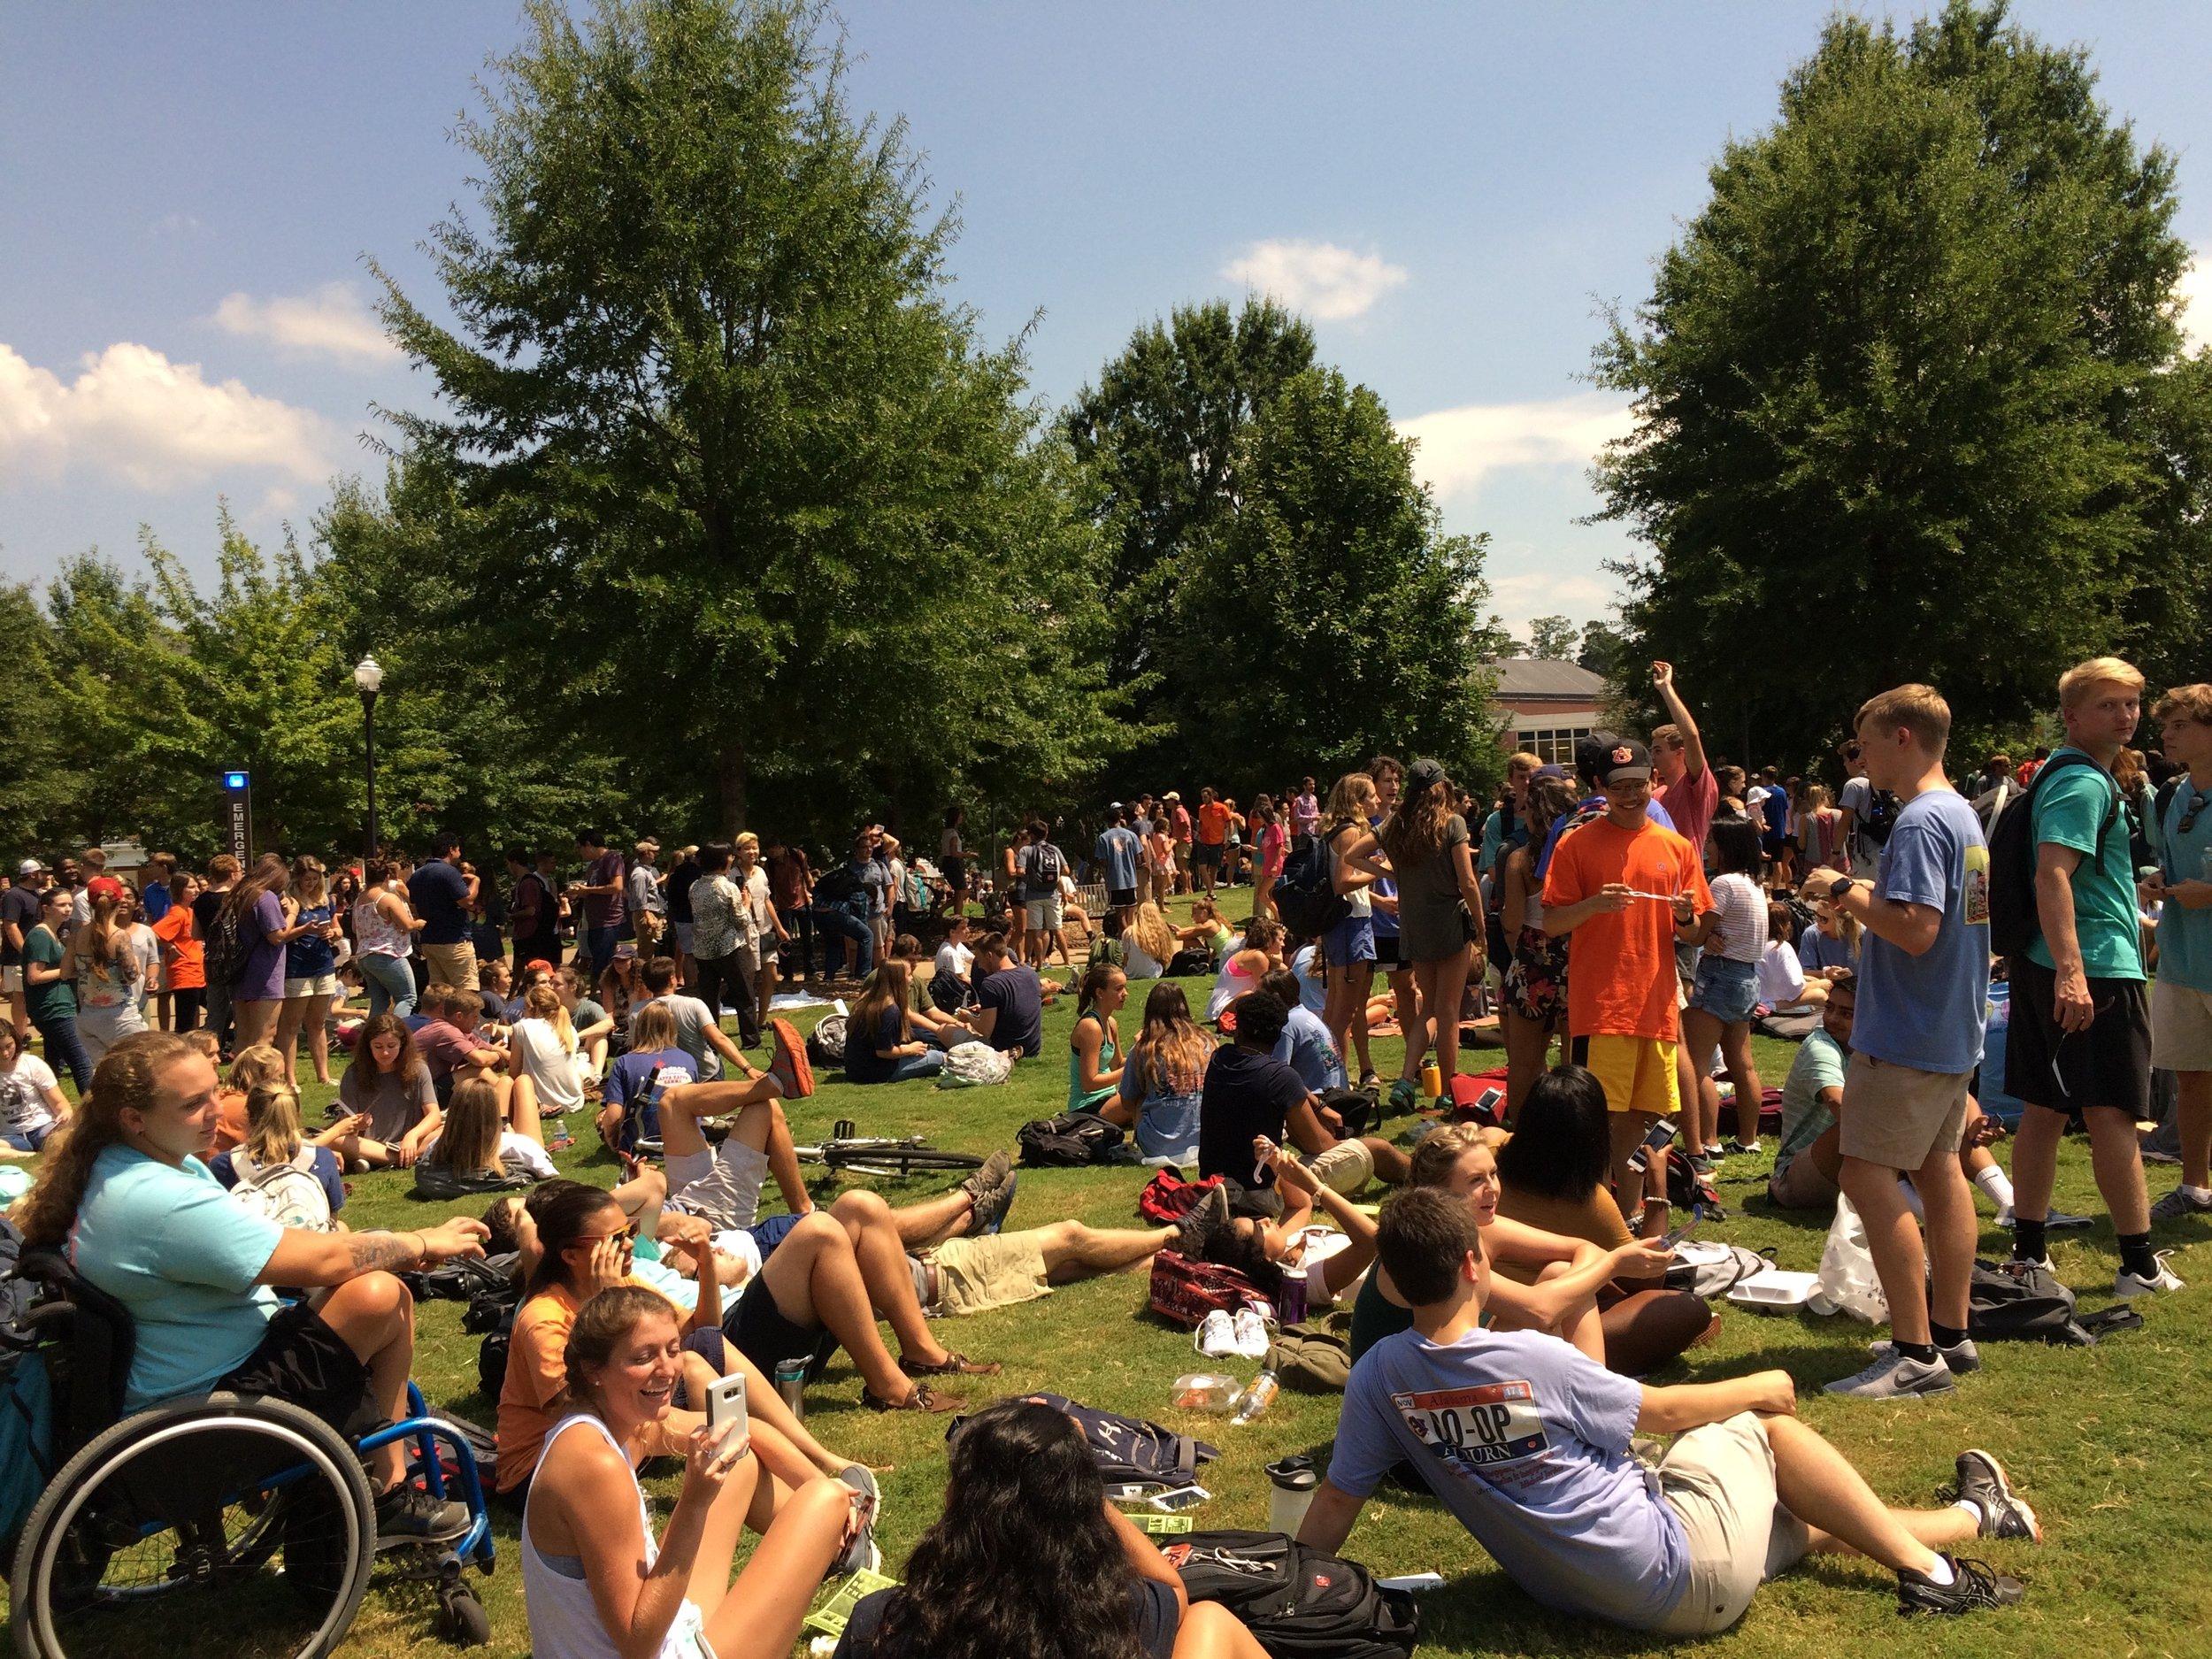 Solar eclipse on the Green at Auburn University, August 21st